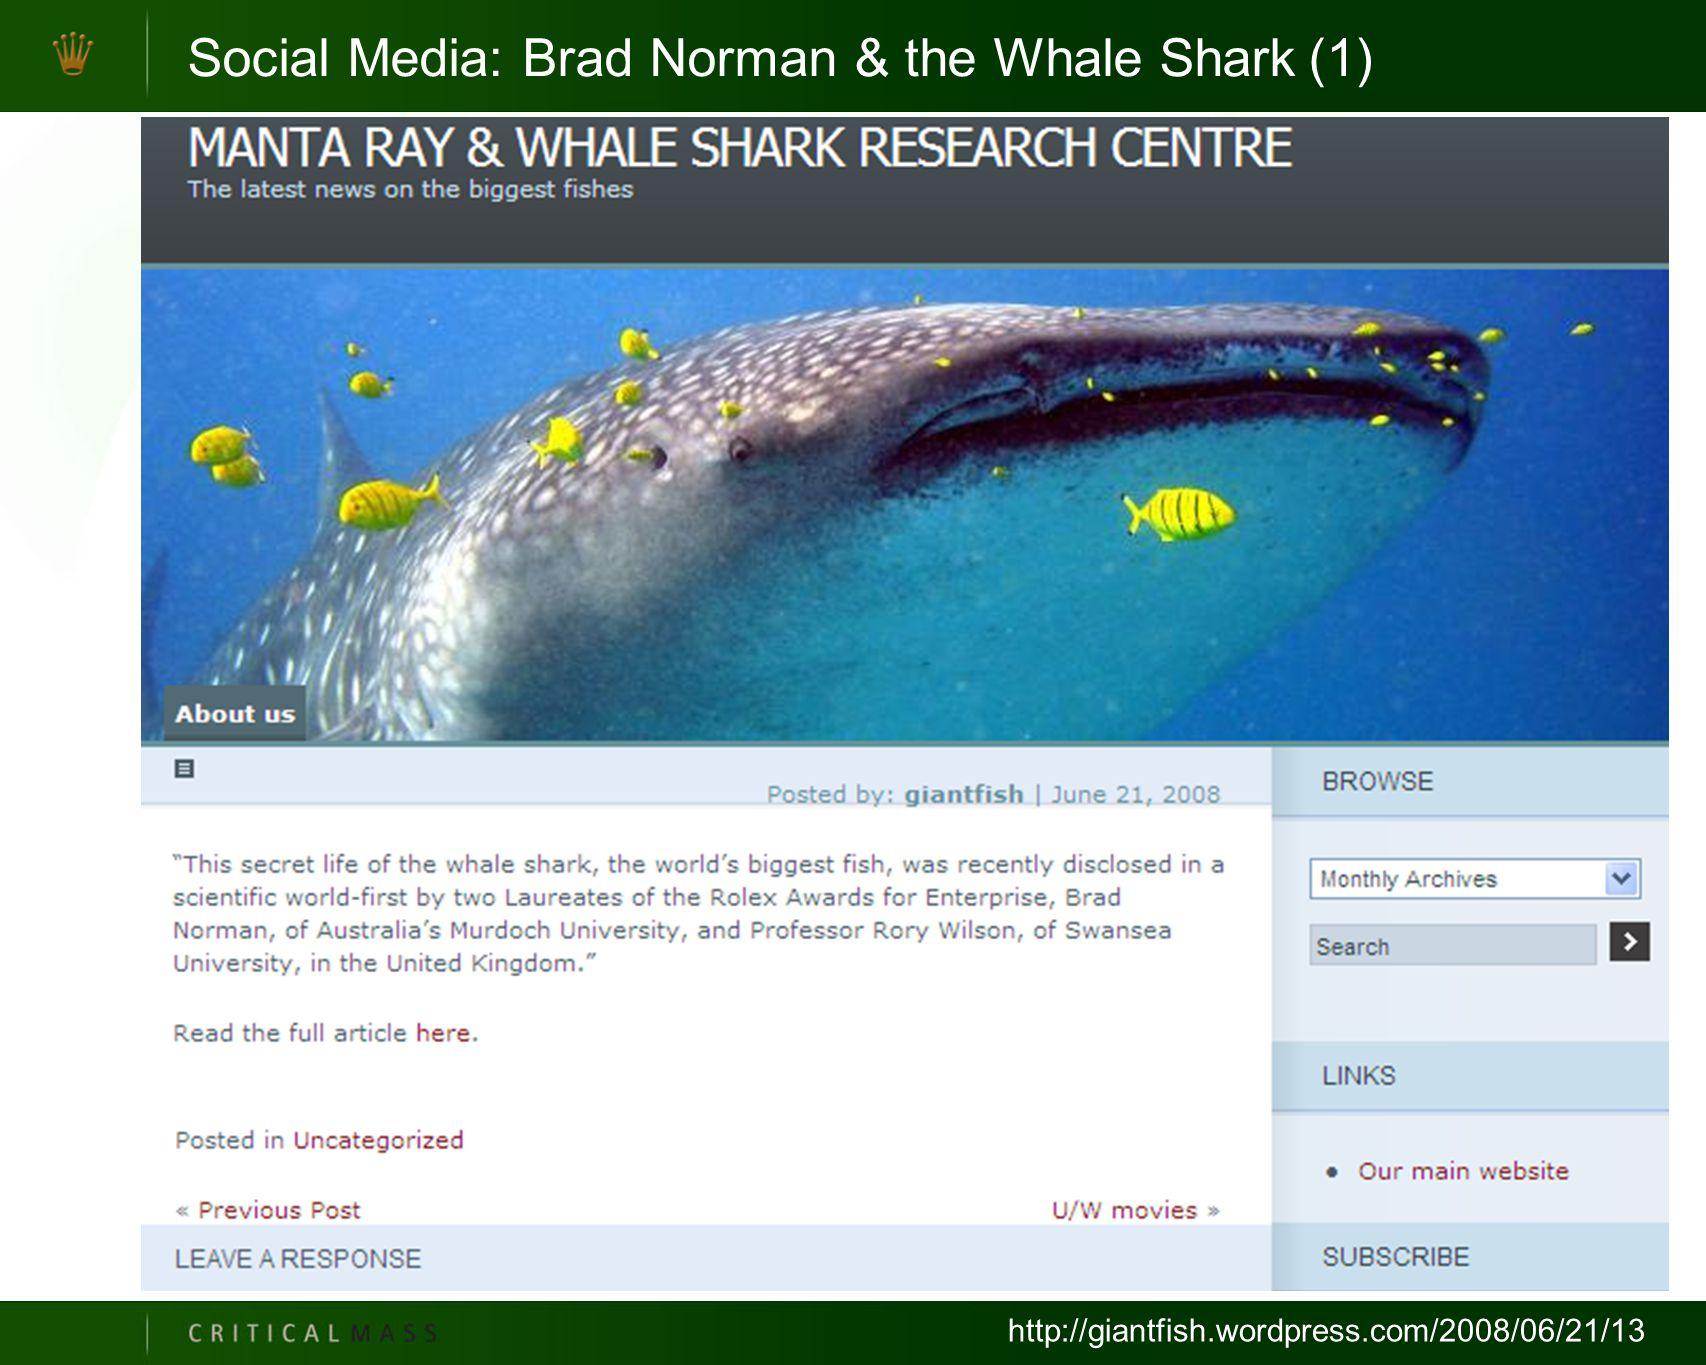 Social Media: Brad Norman & the Whale Shark (1) http://giantfish.wordpress.com/2008/06/21/13